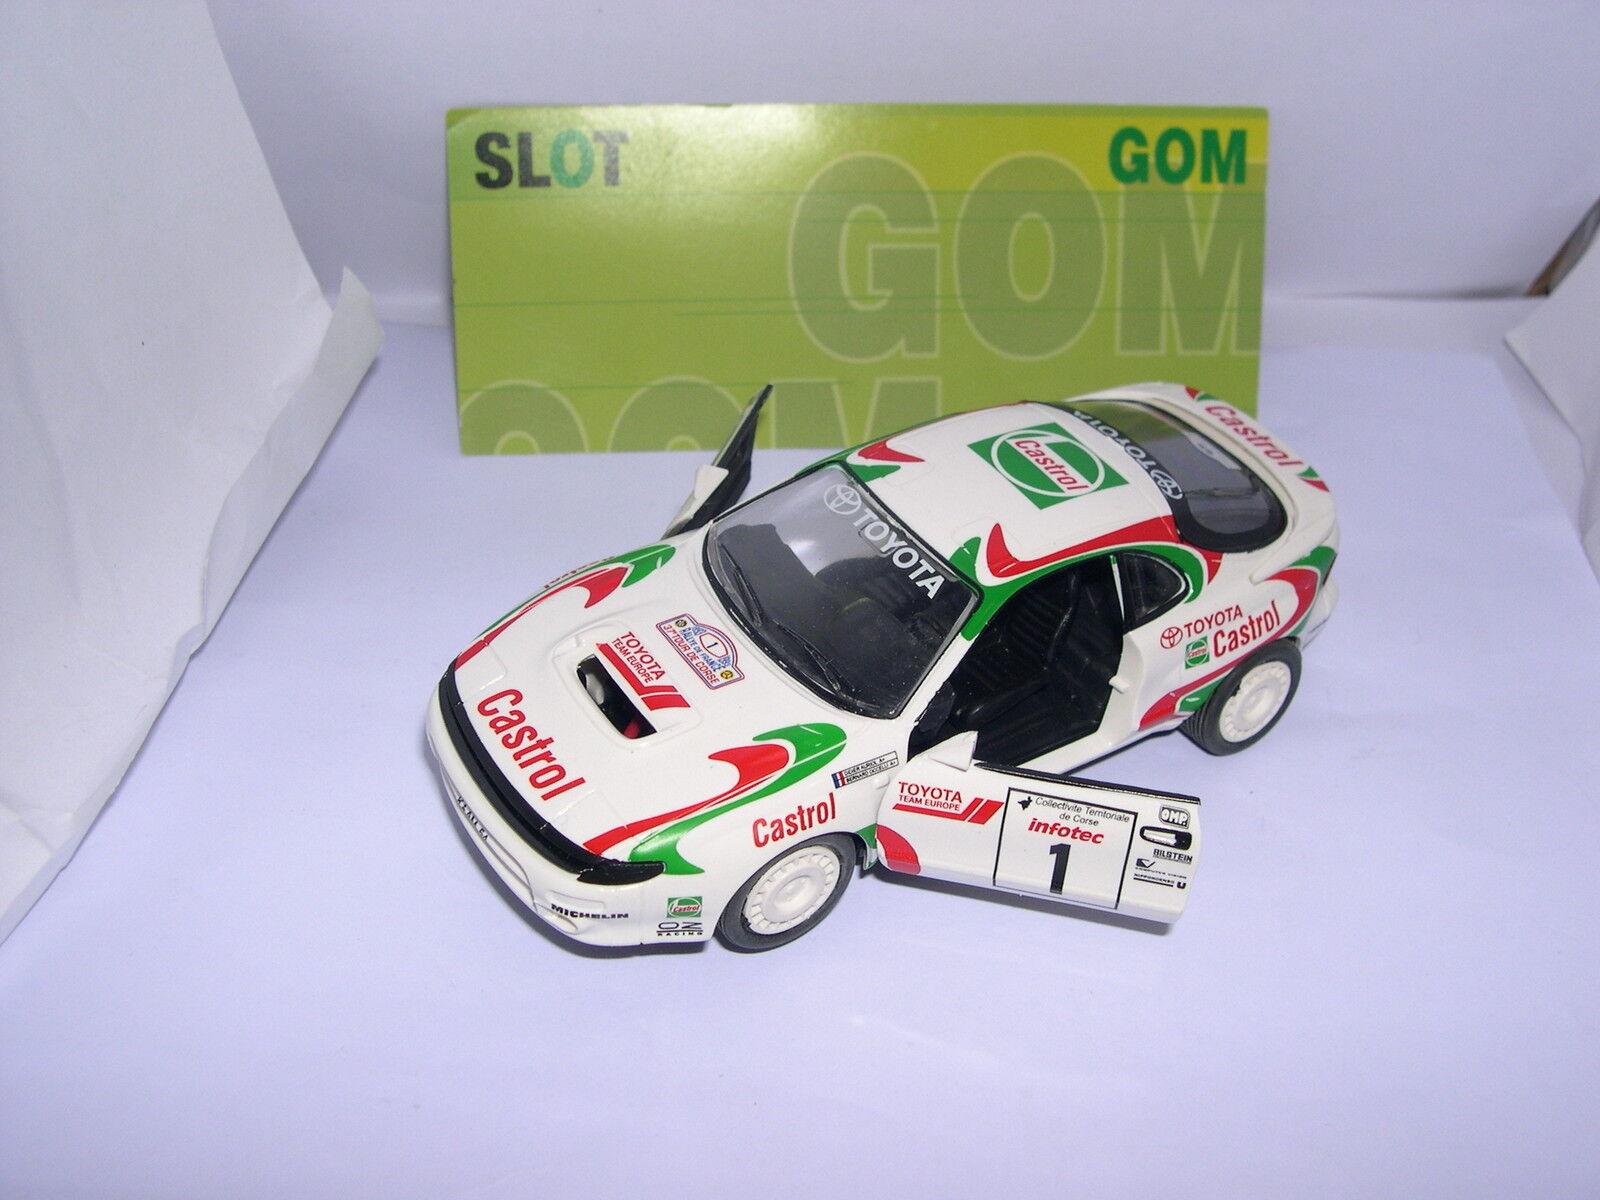 GOM 1010 TOYOTA CELICA TURBO 4WD T. DE CORSE'93 D.AURIOL NEVER IN THE MARKET